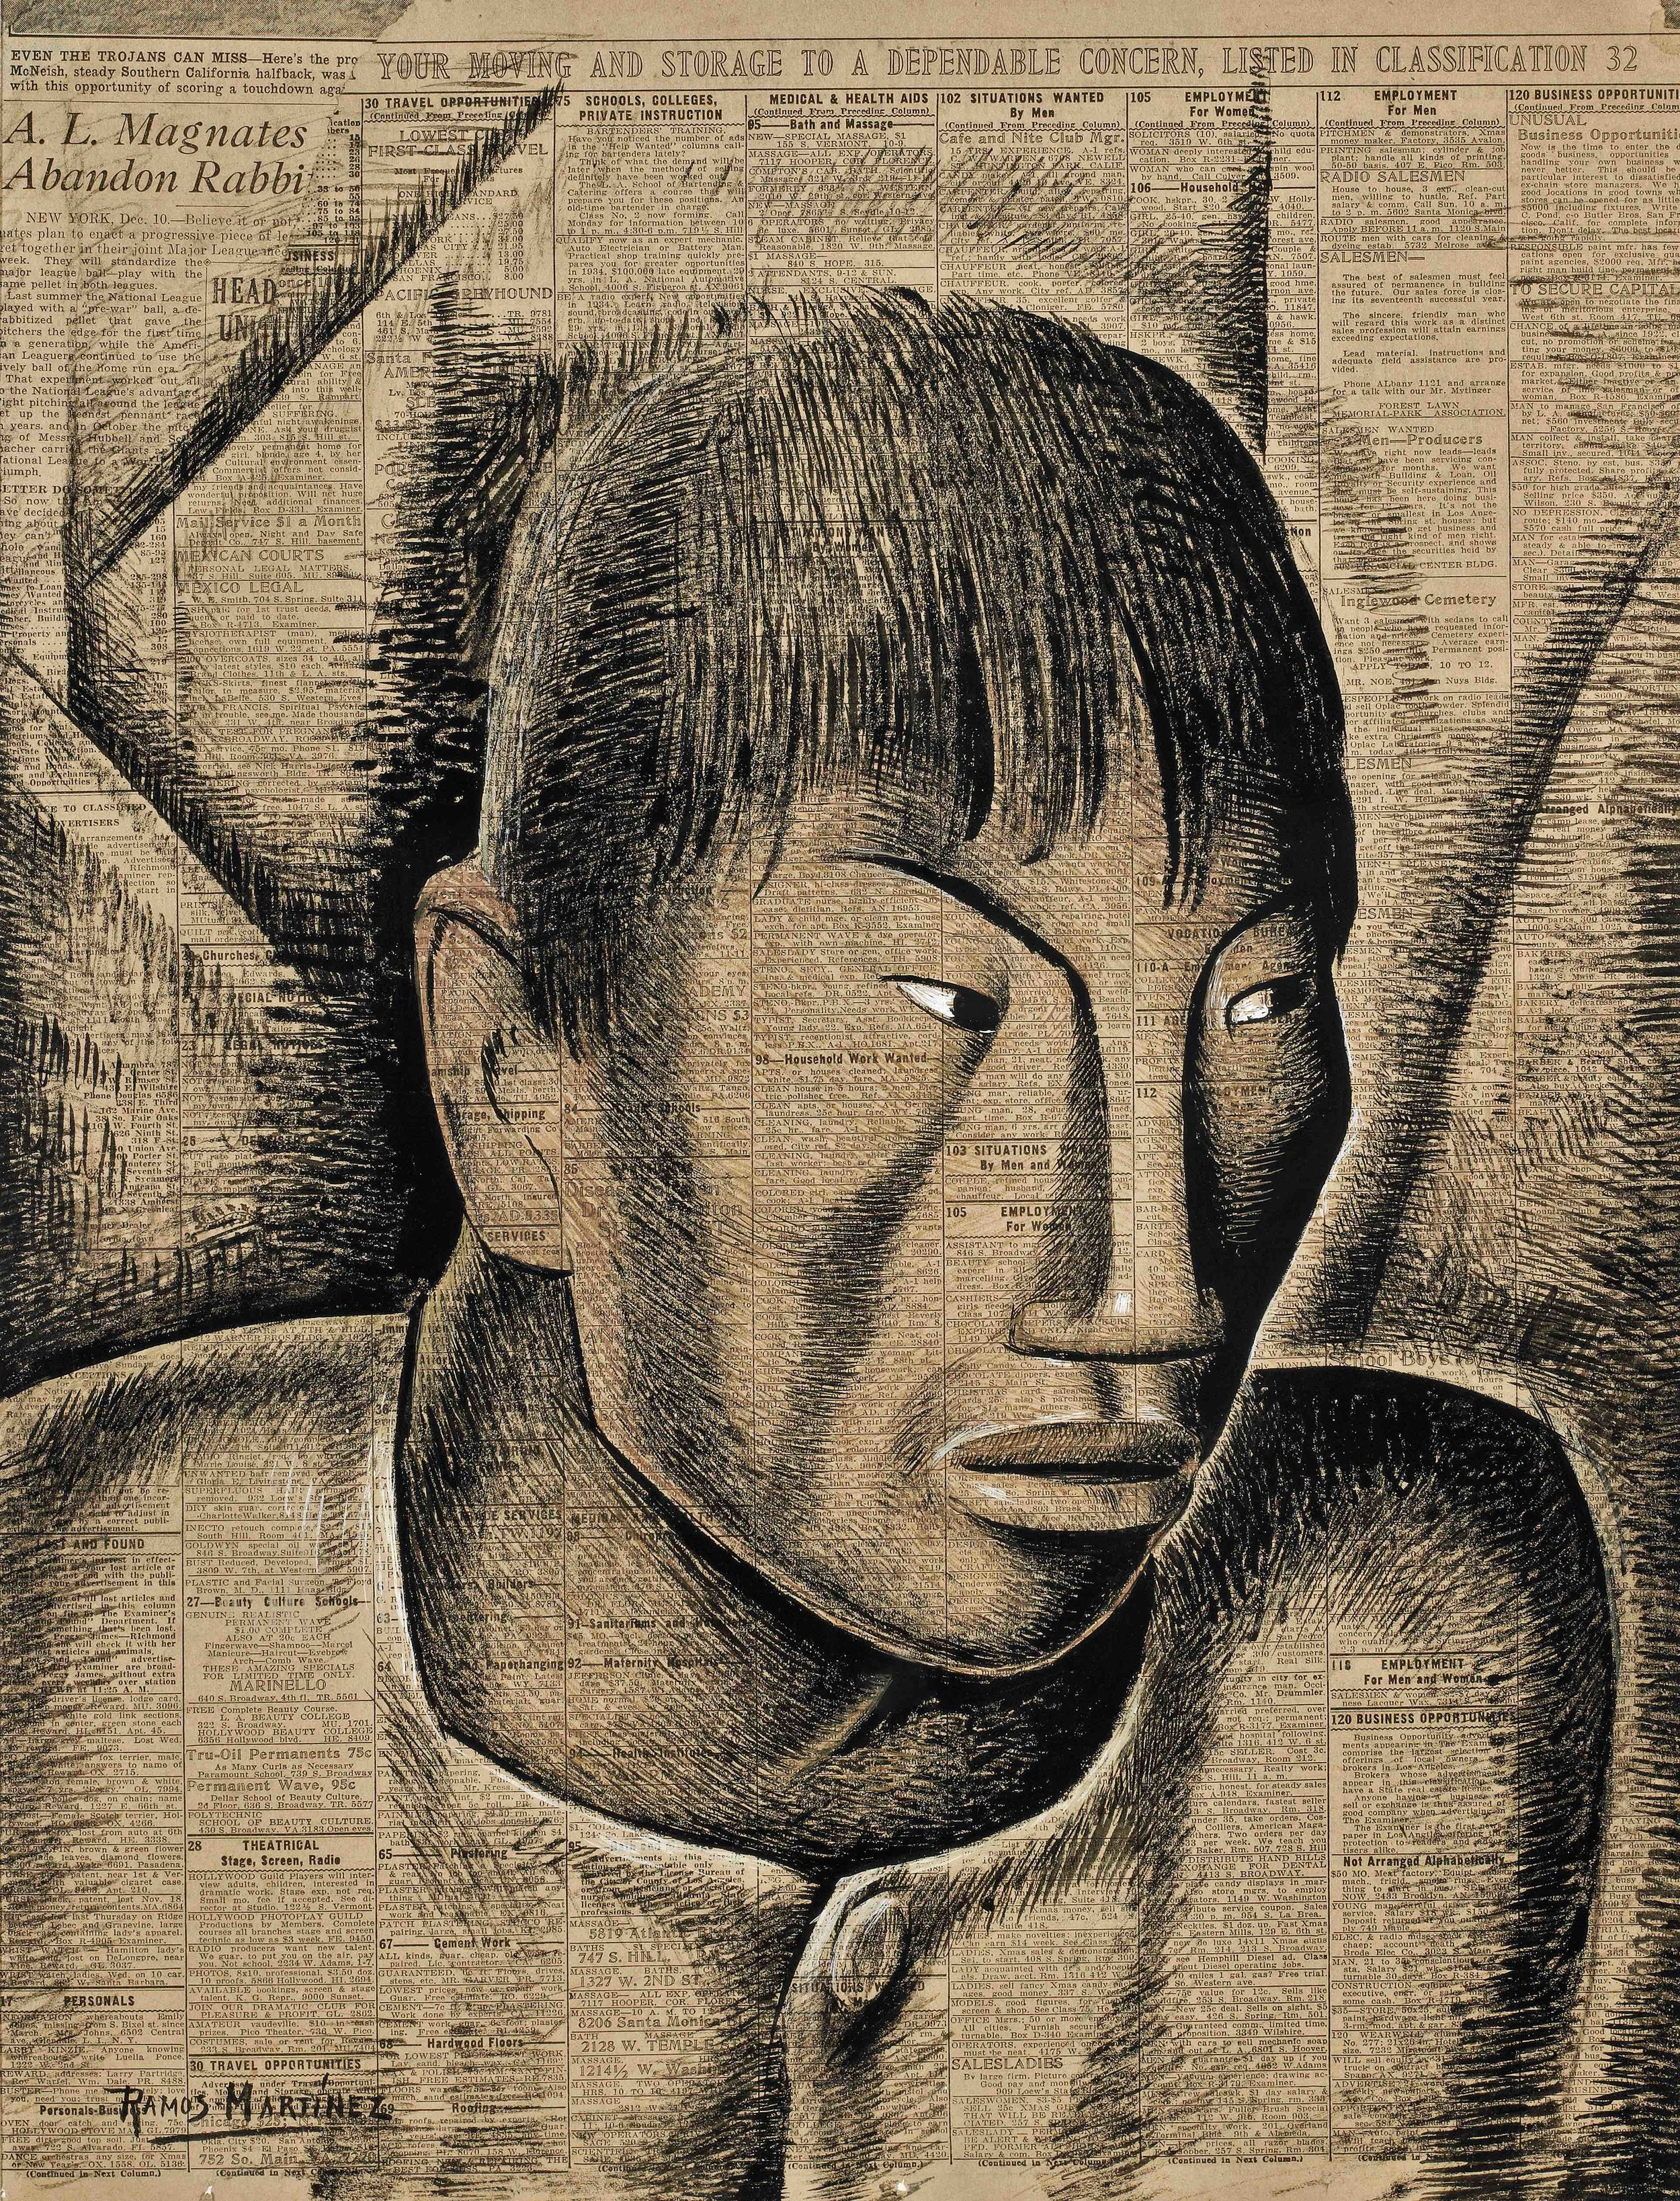 Cabeza Indígena / Indian Head  1934 tempera on newsprint / temple sobre papel periódico ( Los Angeles Times , 1934) 21.3 x 16.3 inches; 54 x 41.3 centímetros Private collection